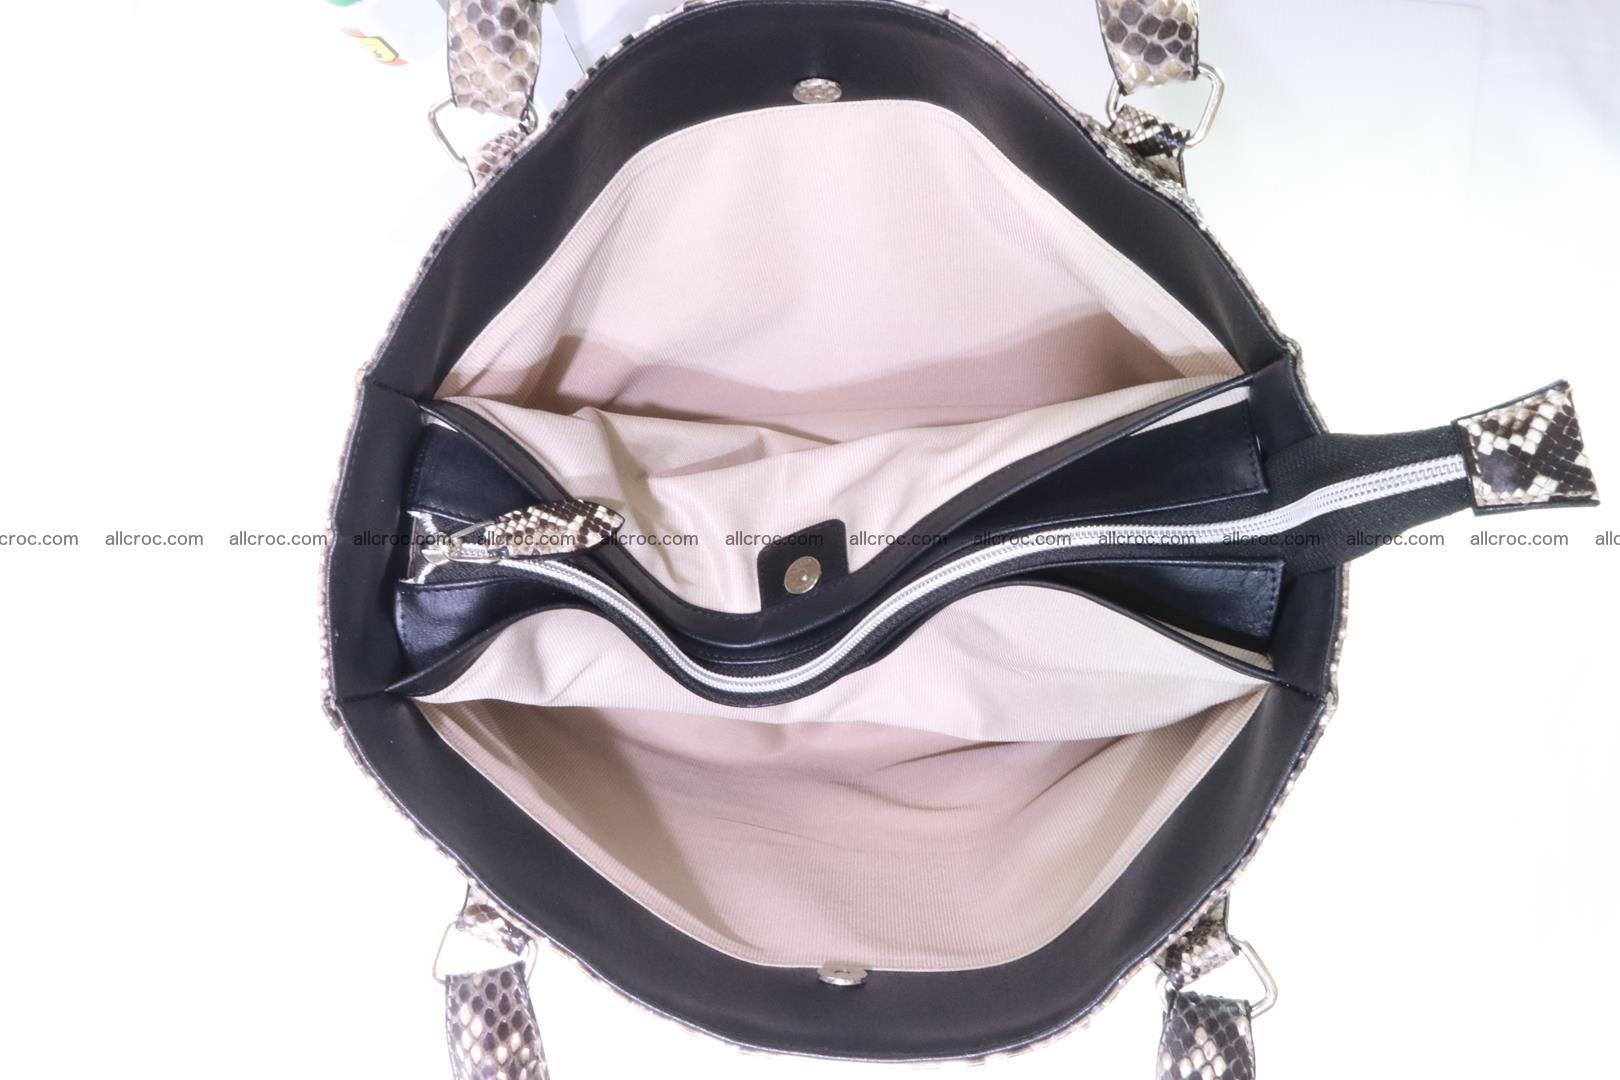 Python skin handbag for lady from genuine Python skin 206 Foto 9